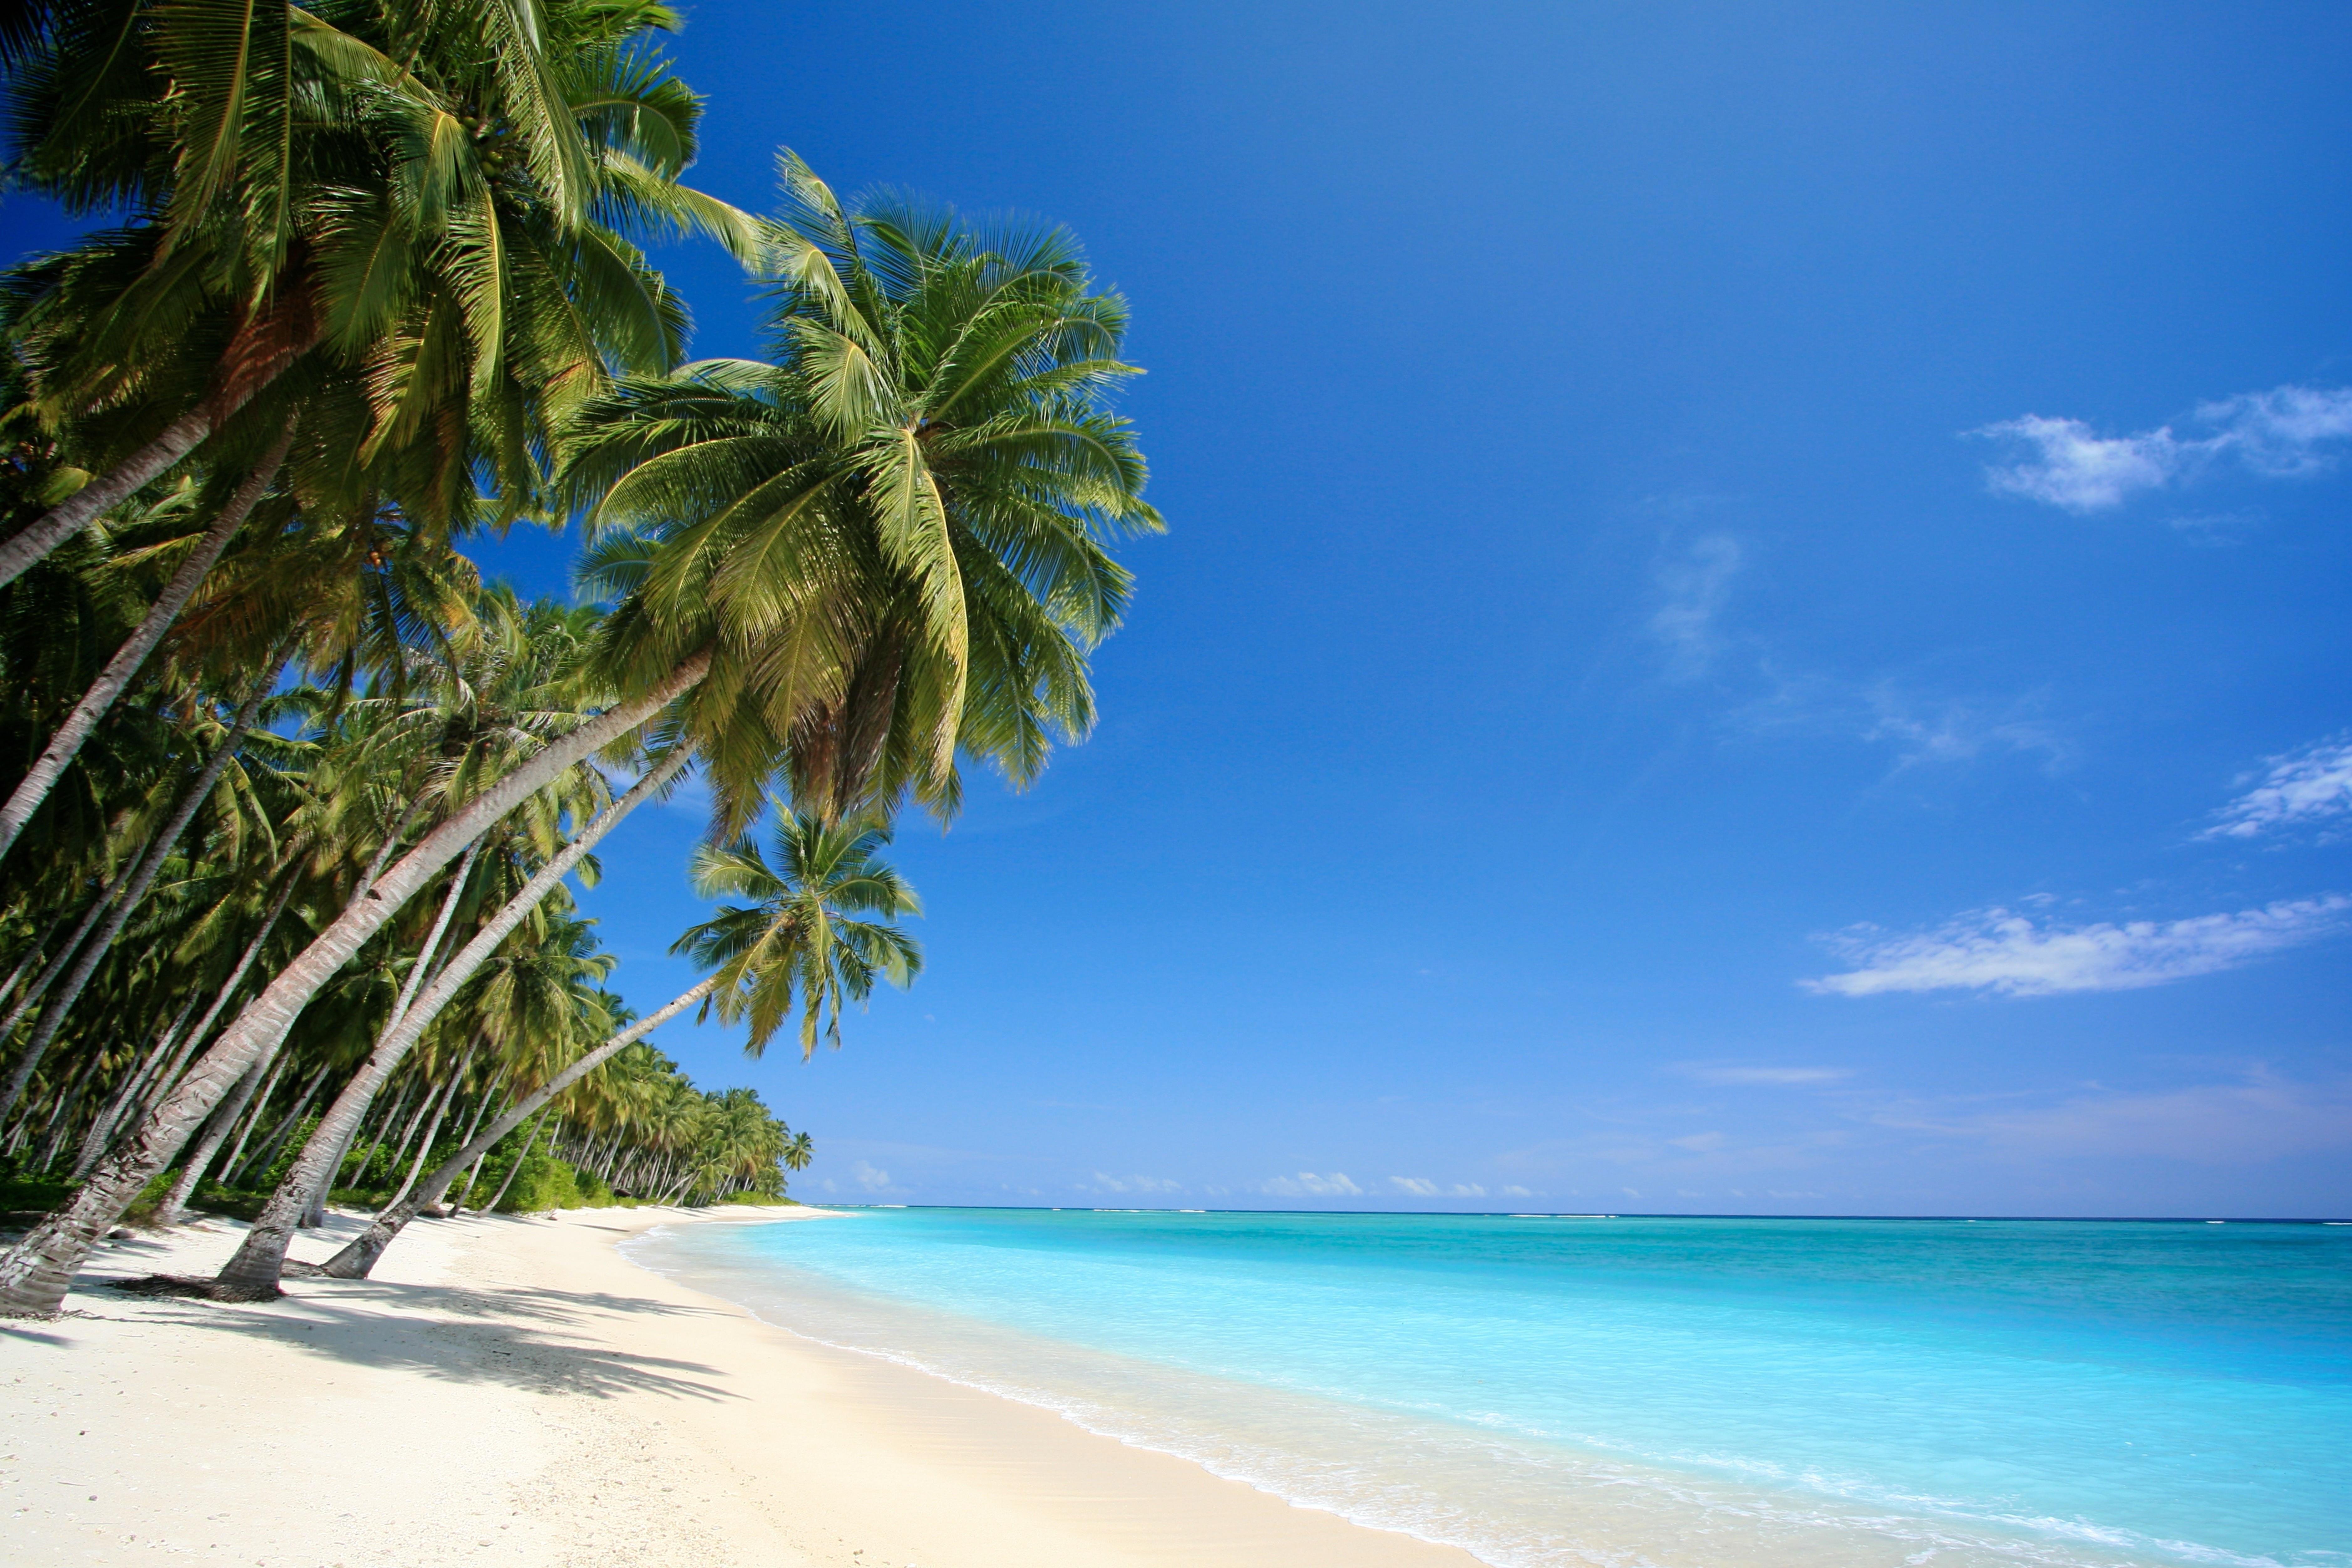 Wallpaper Costa Rica Girls Beach Palm Trees Sea Landscape Nature Wallpapers Hd